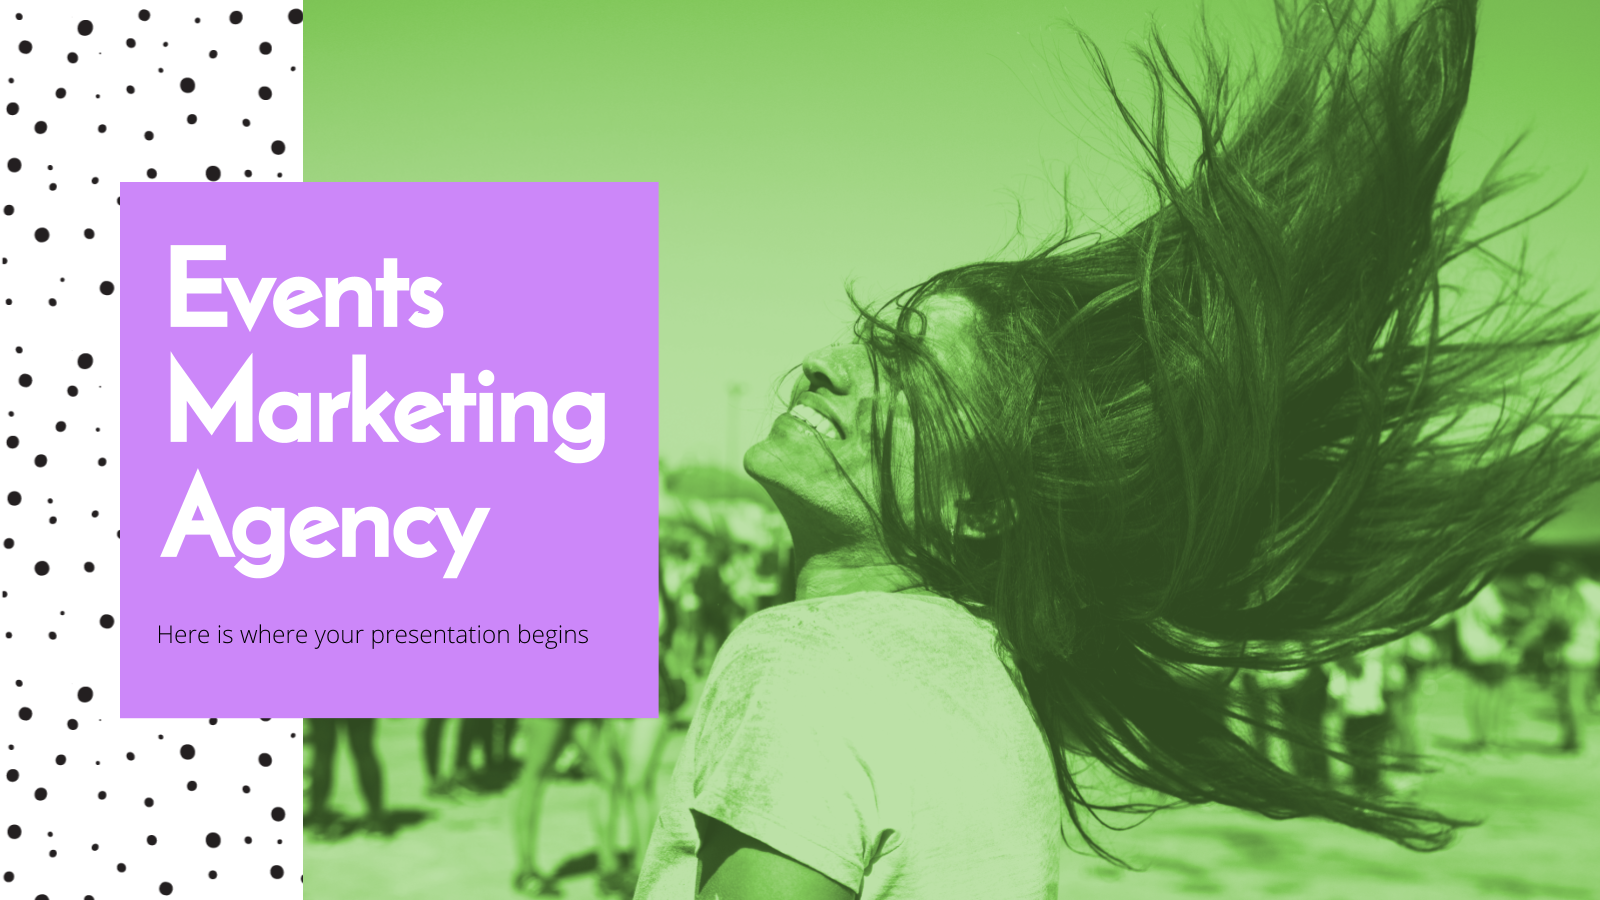 Events Marketing Agency presentation template